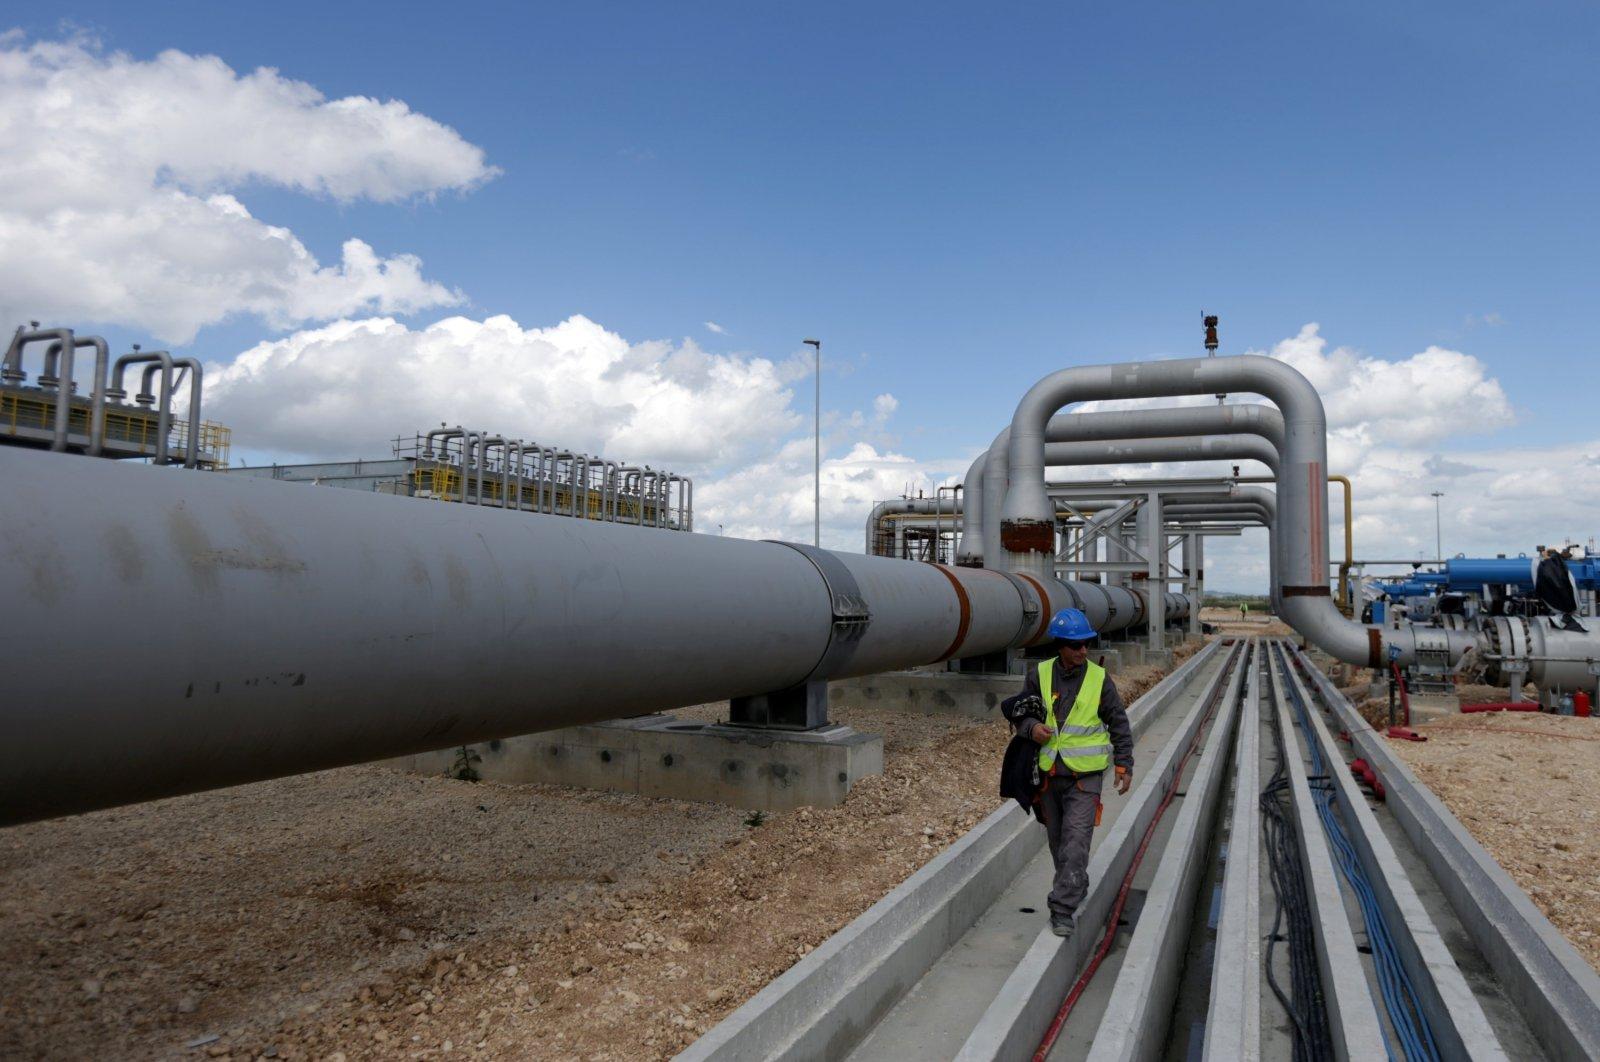 A local employee walks near a compressor station of the Trans Adriatic Pipeline (TAP) in Seman near Fier, Albania, April 11, 2019. (Reuters Photo)